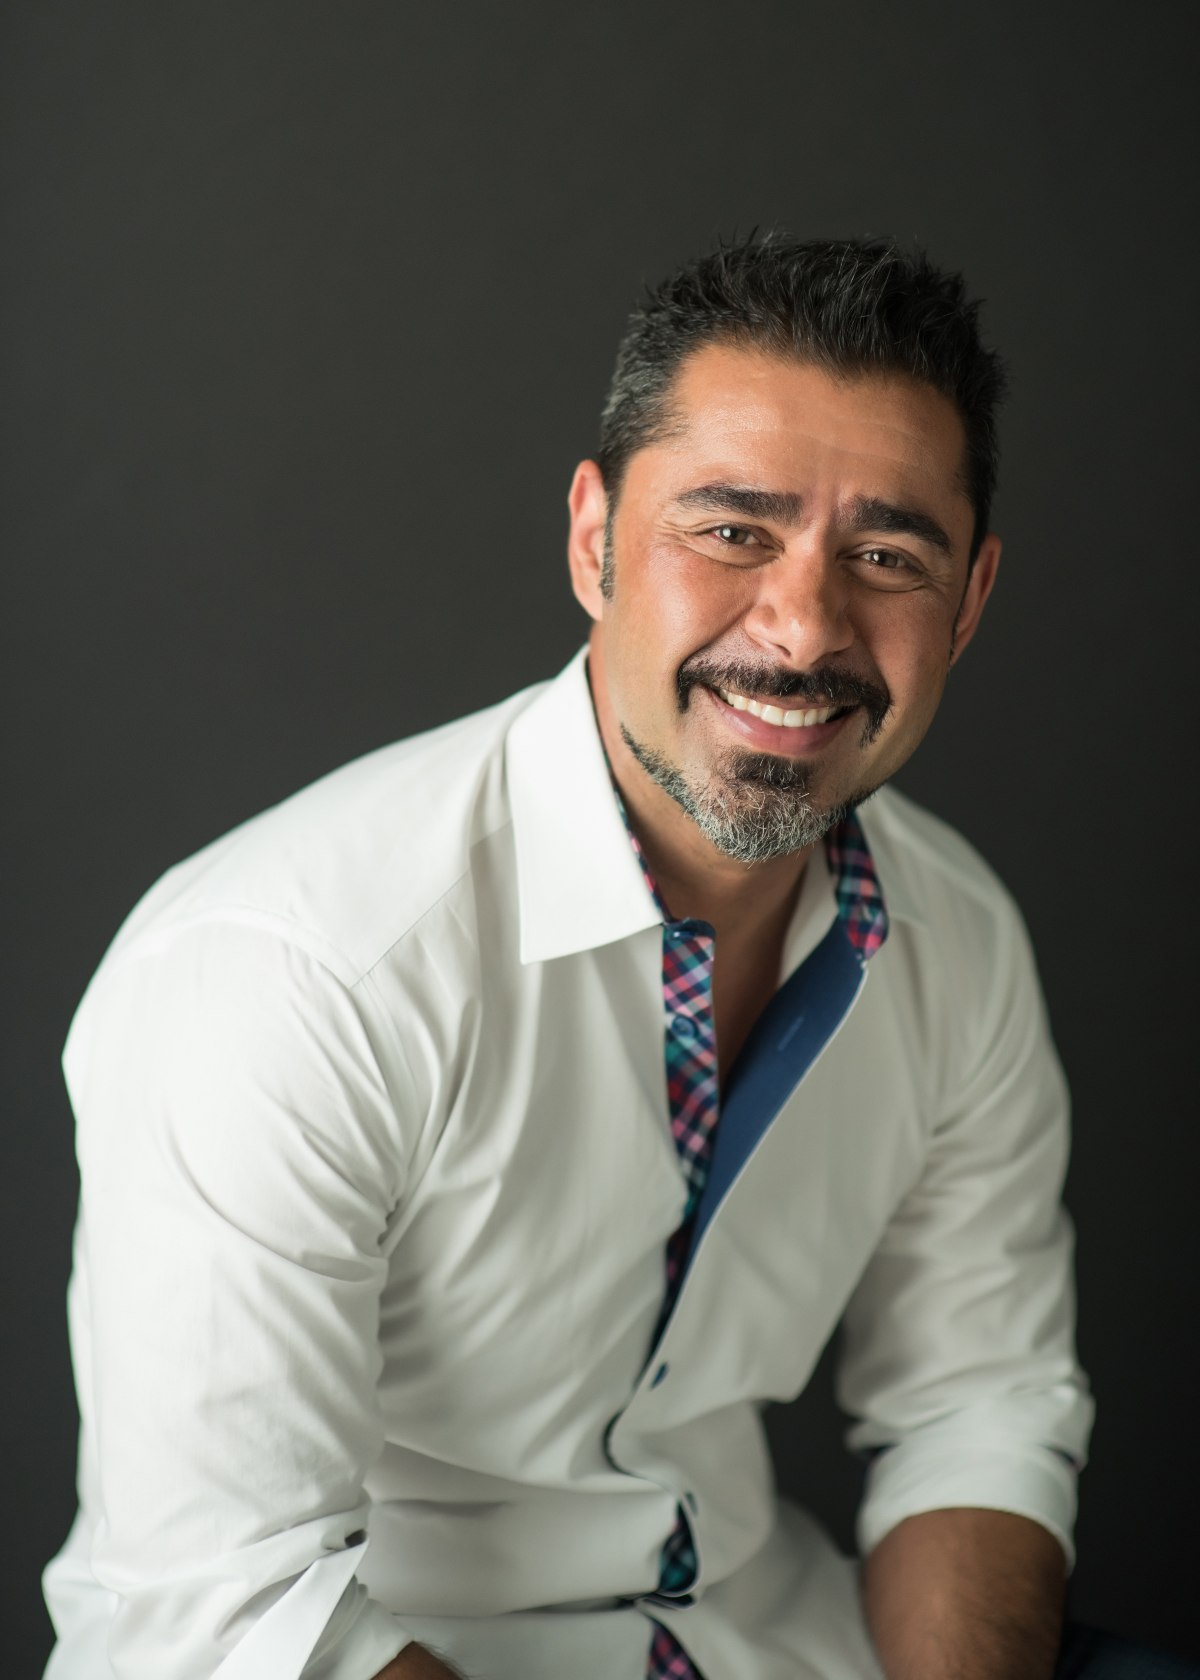 Headshot Dr. Robert Marzban